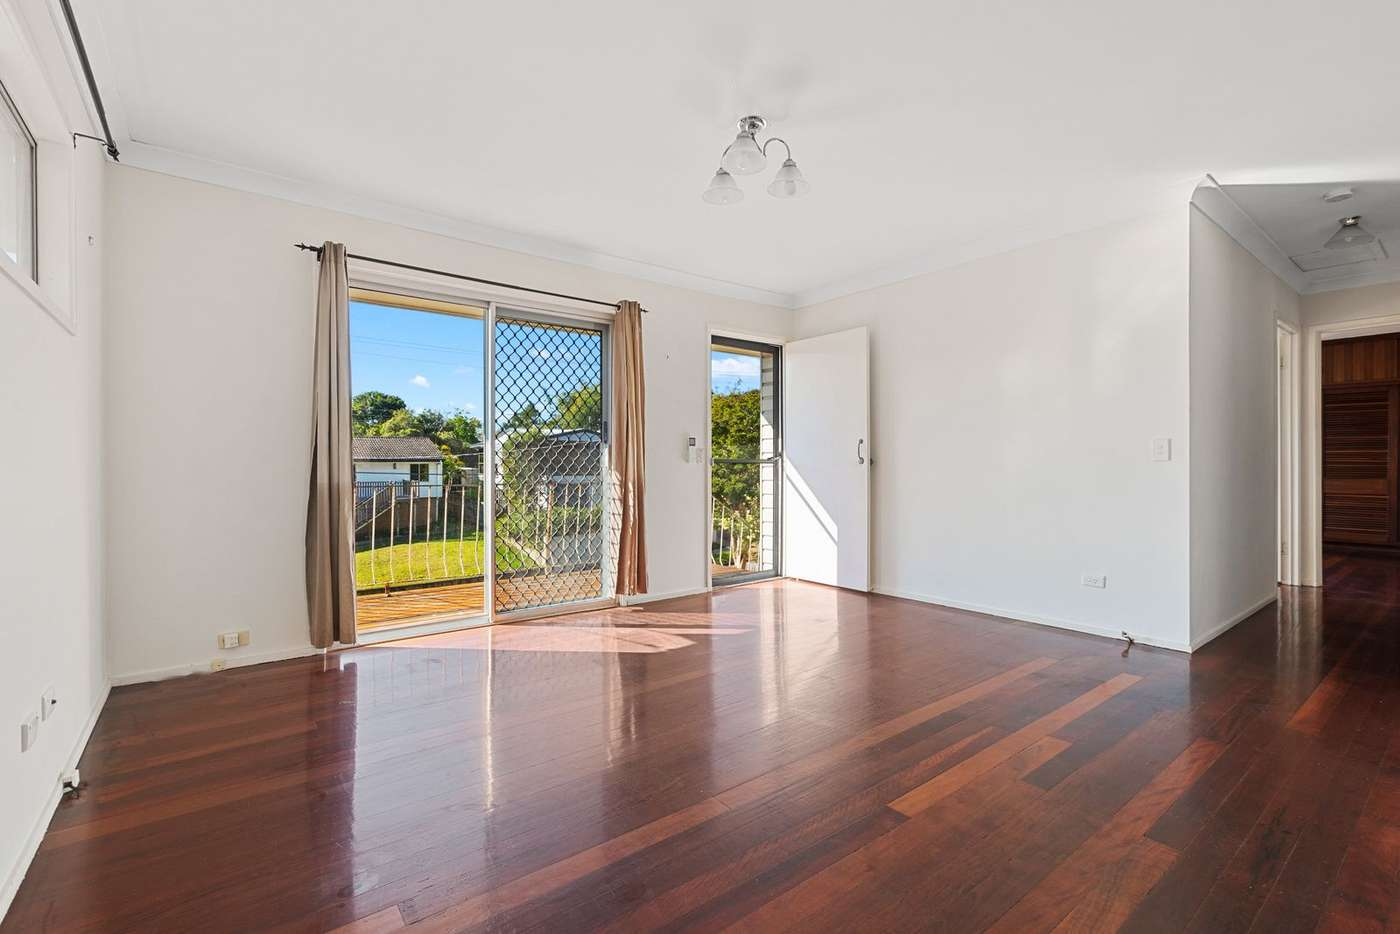 Sixth view of Homely house listing, 26 Verbena Street, Mount Gravatt QLD 4122